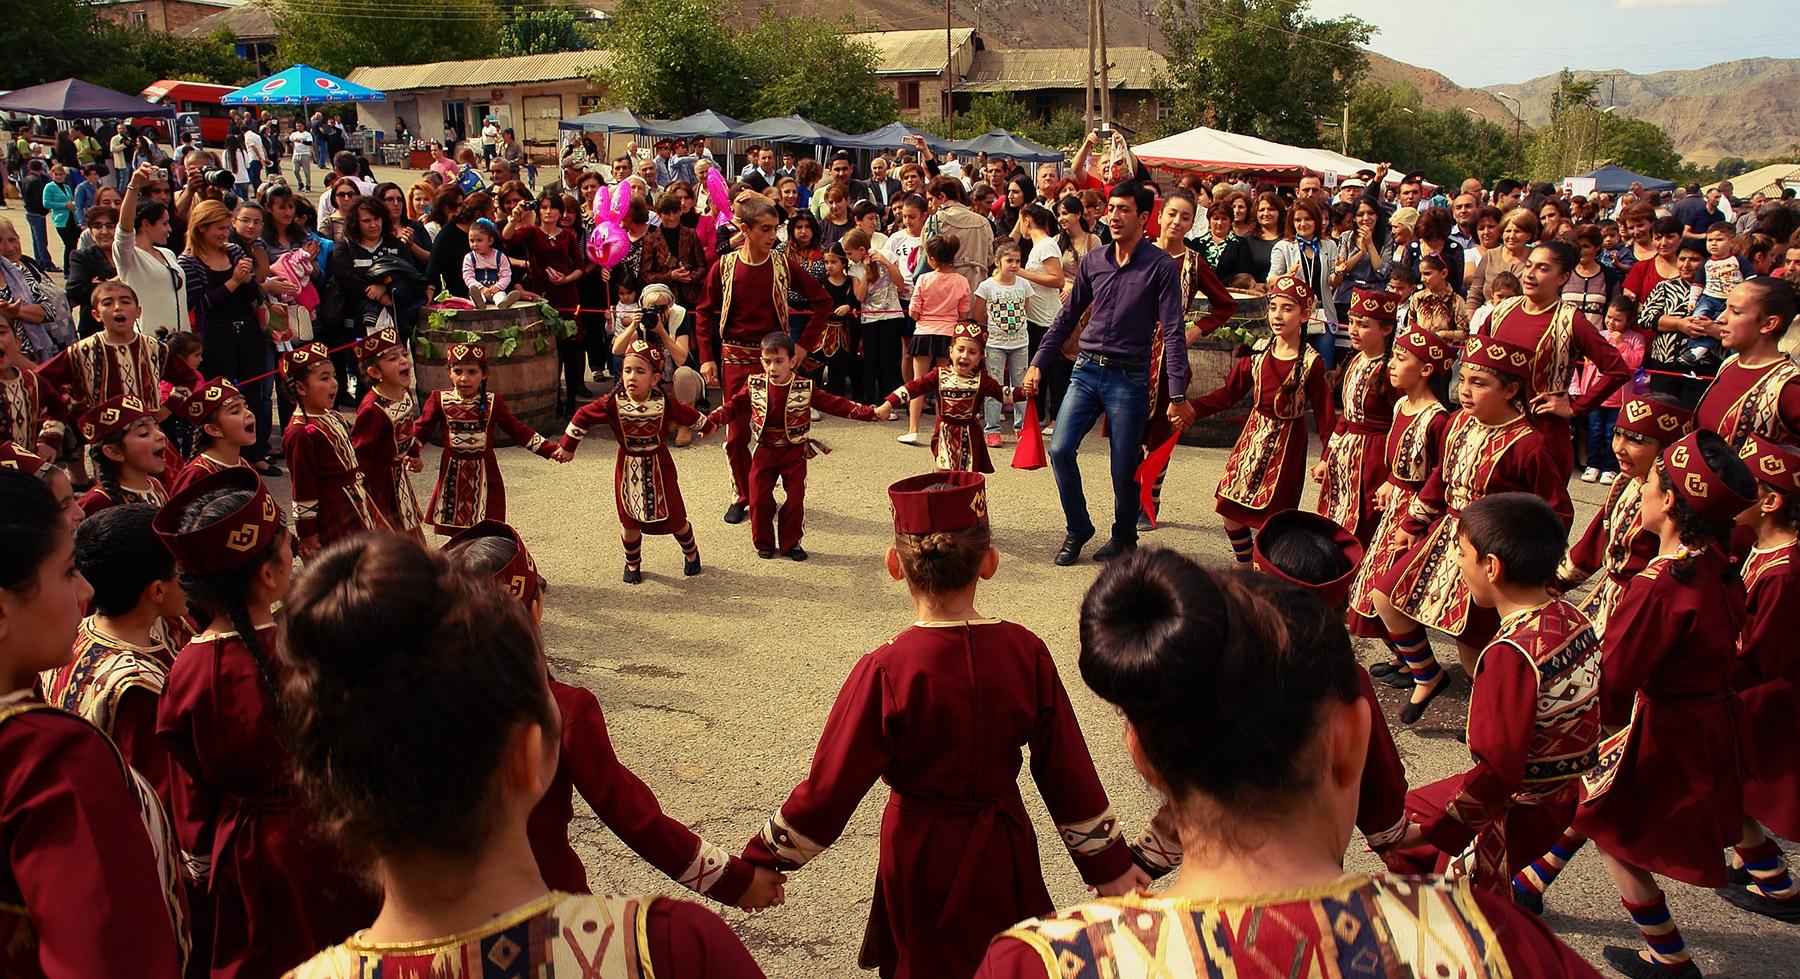 celebrating armenian wine areni festival holidays lot date english russia says he englishrussia start